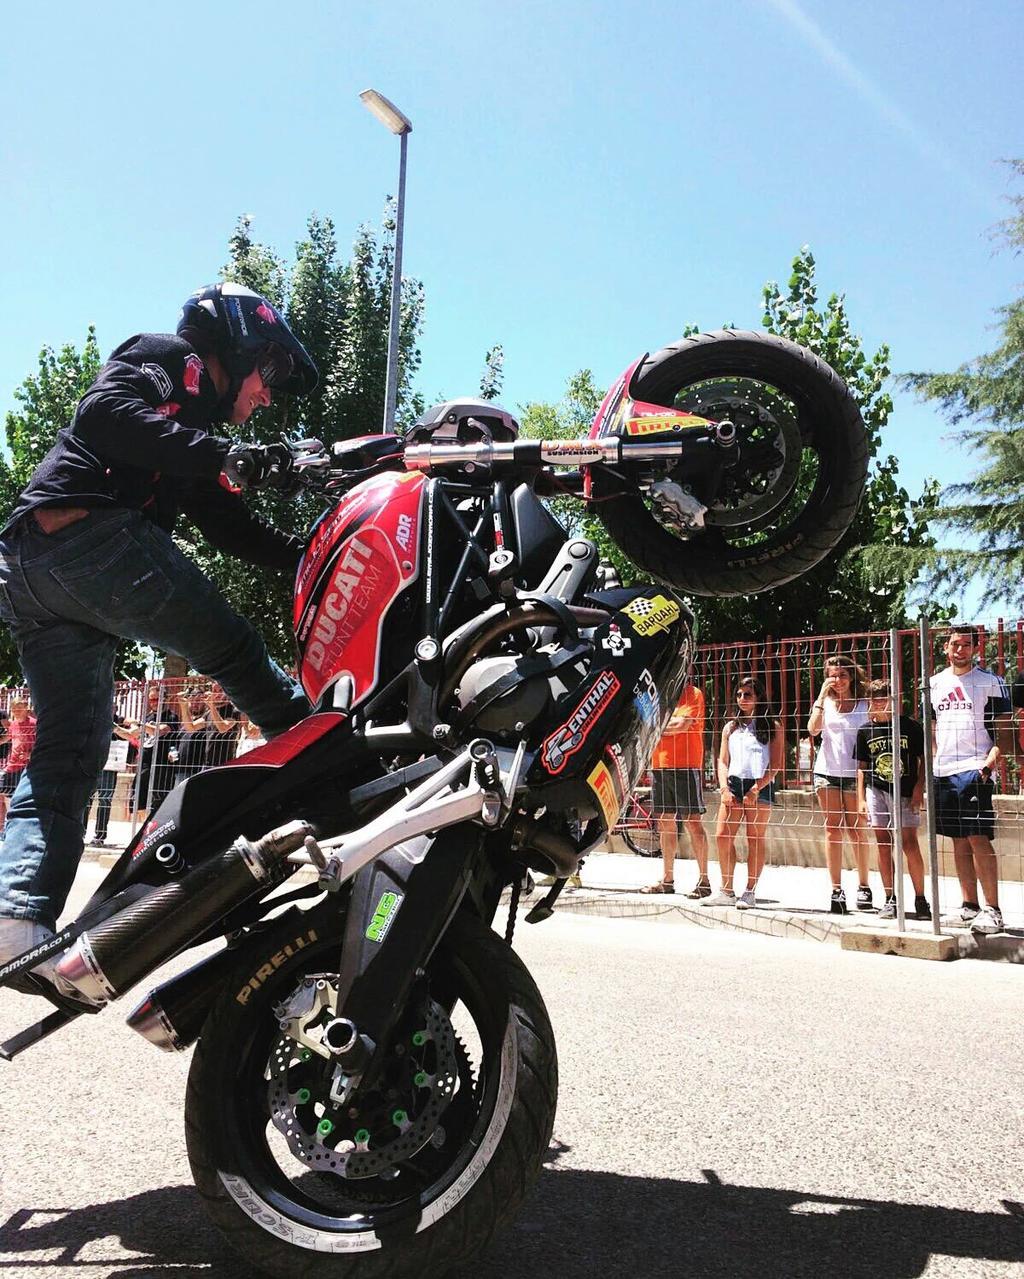 14-sixty-rider-festival_2016_julian_simon_club_emilio_zamora_ducati_stunt_team_motor_show_freestyle_moto_espectaculo_exhibicion_wheelie_ng_motocorse_adr_graphics_nzi_lolopamanes_ducatistas_